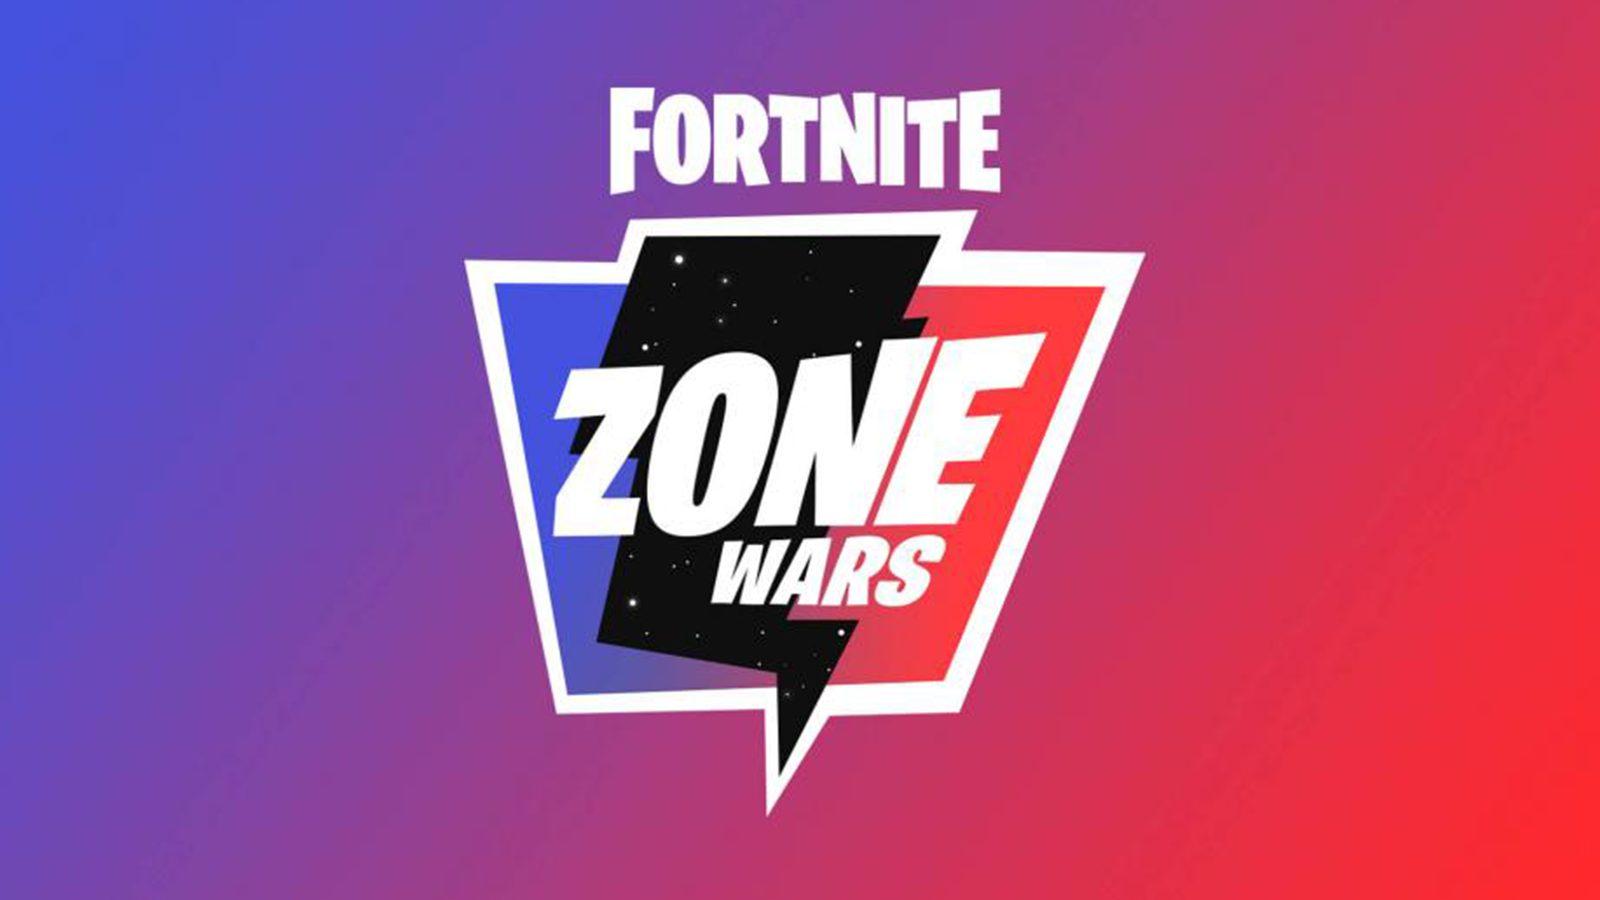 Guerre de Zones